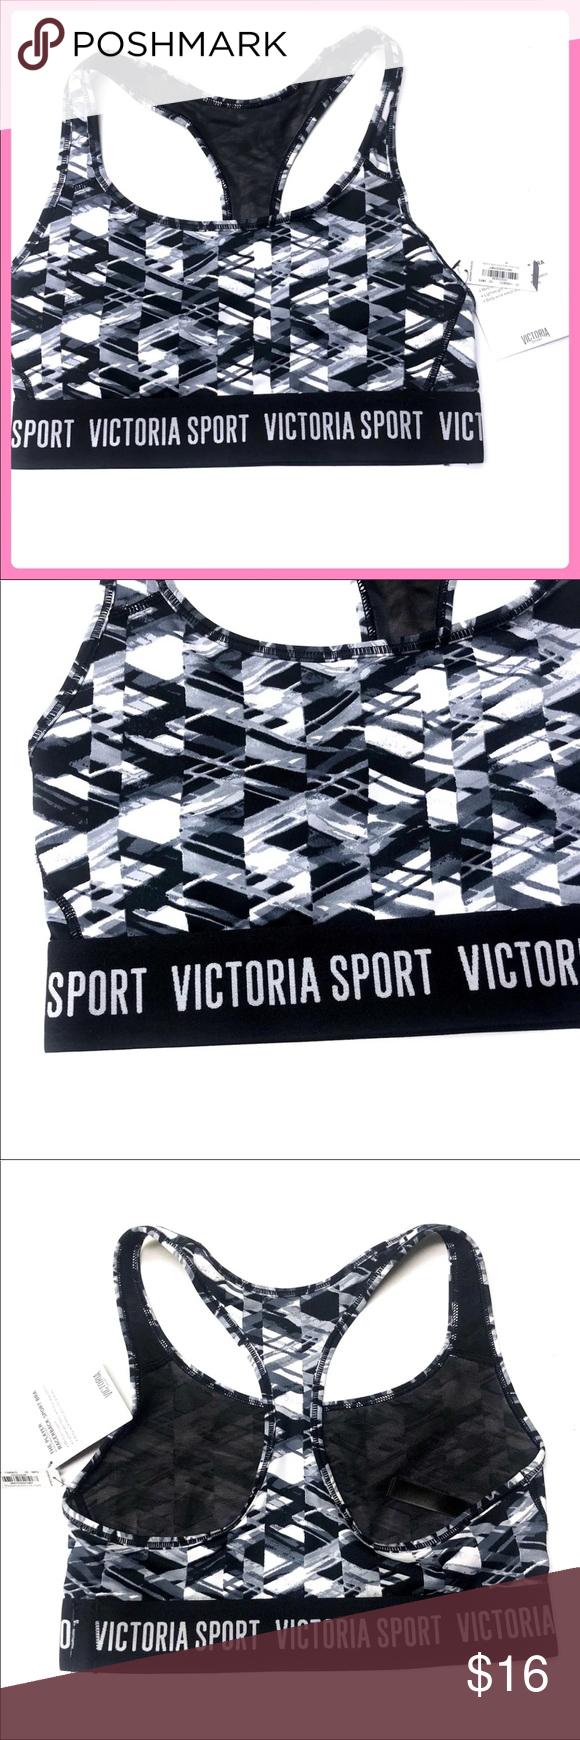 New Victoria's Secret Sport Bra Brand new Victoria's